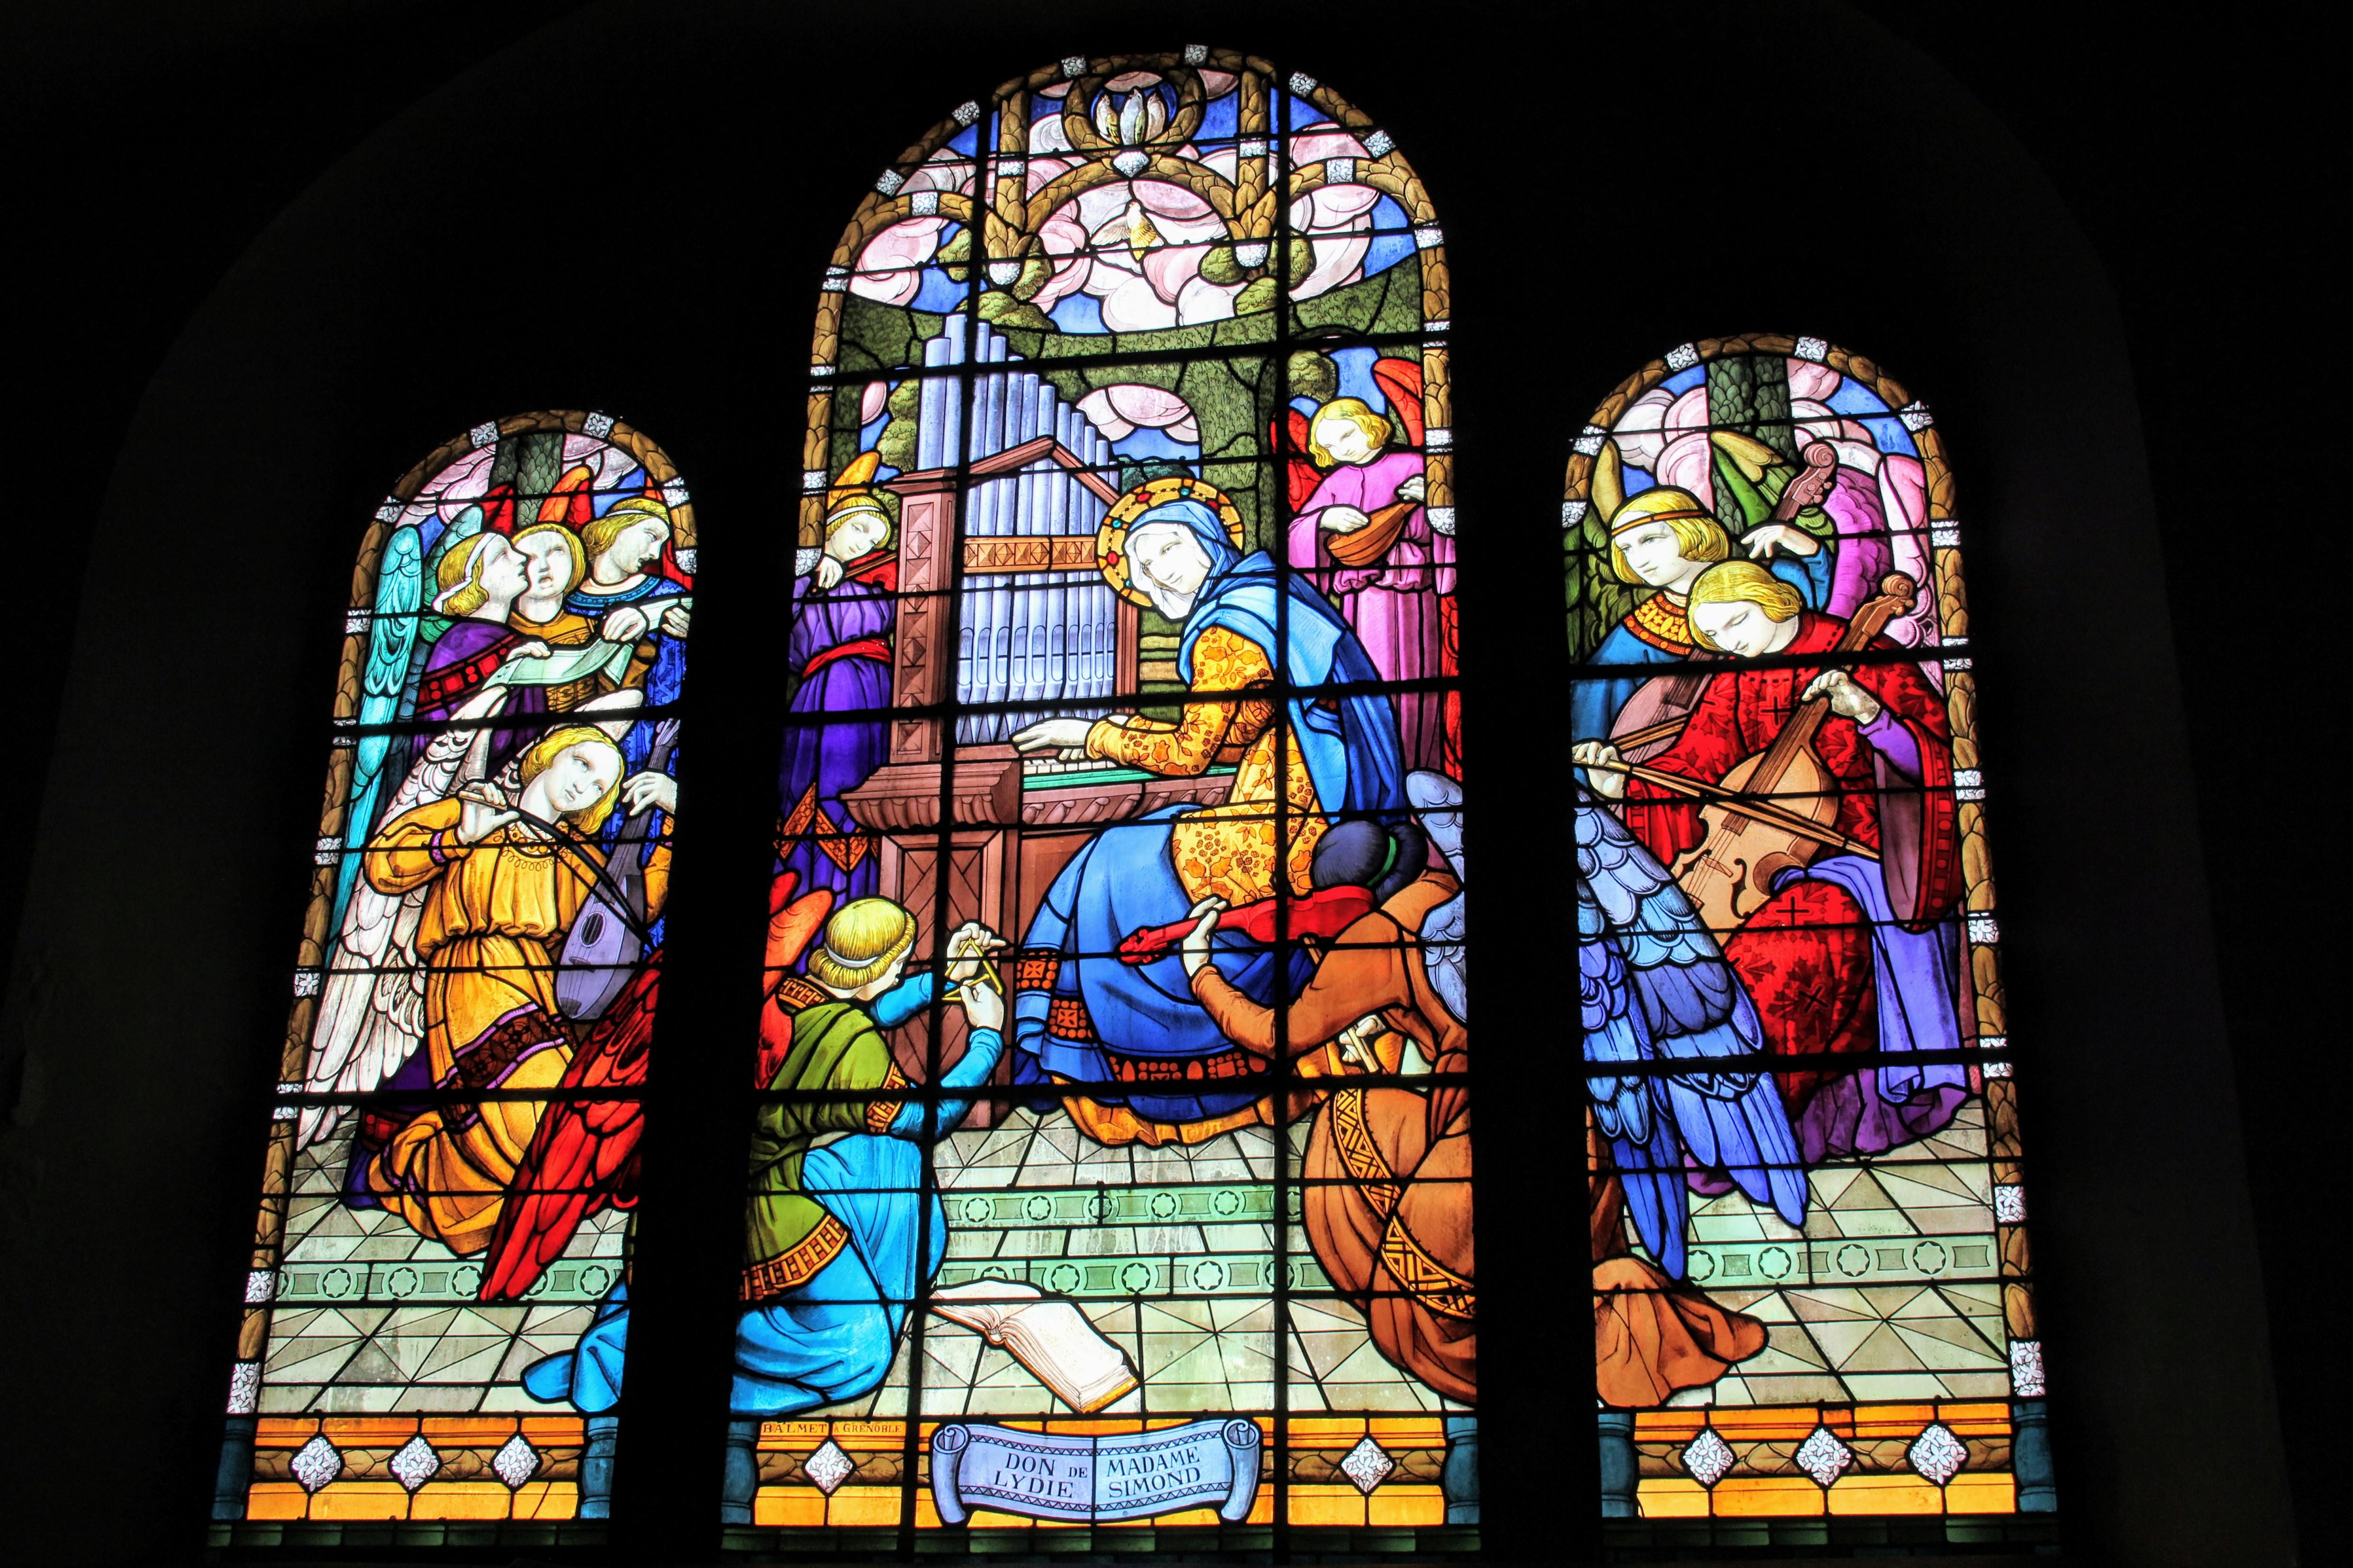 Eglise St-Michel